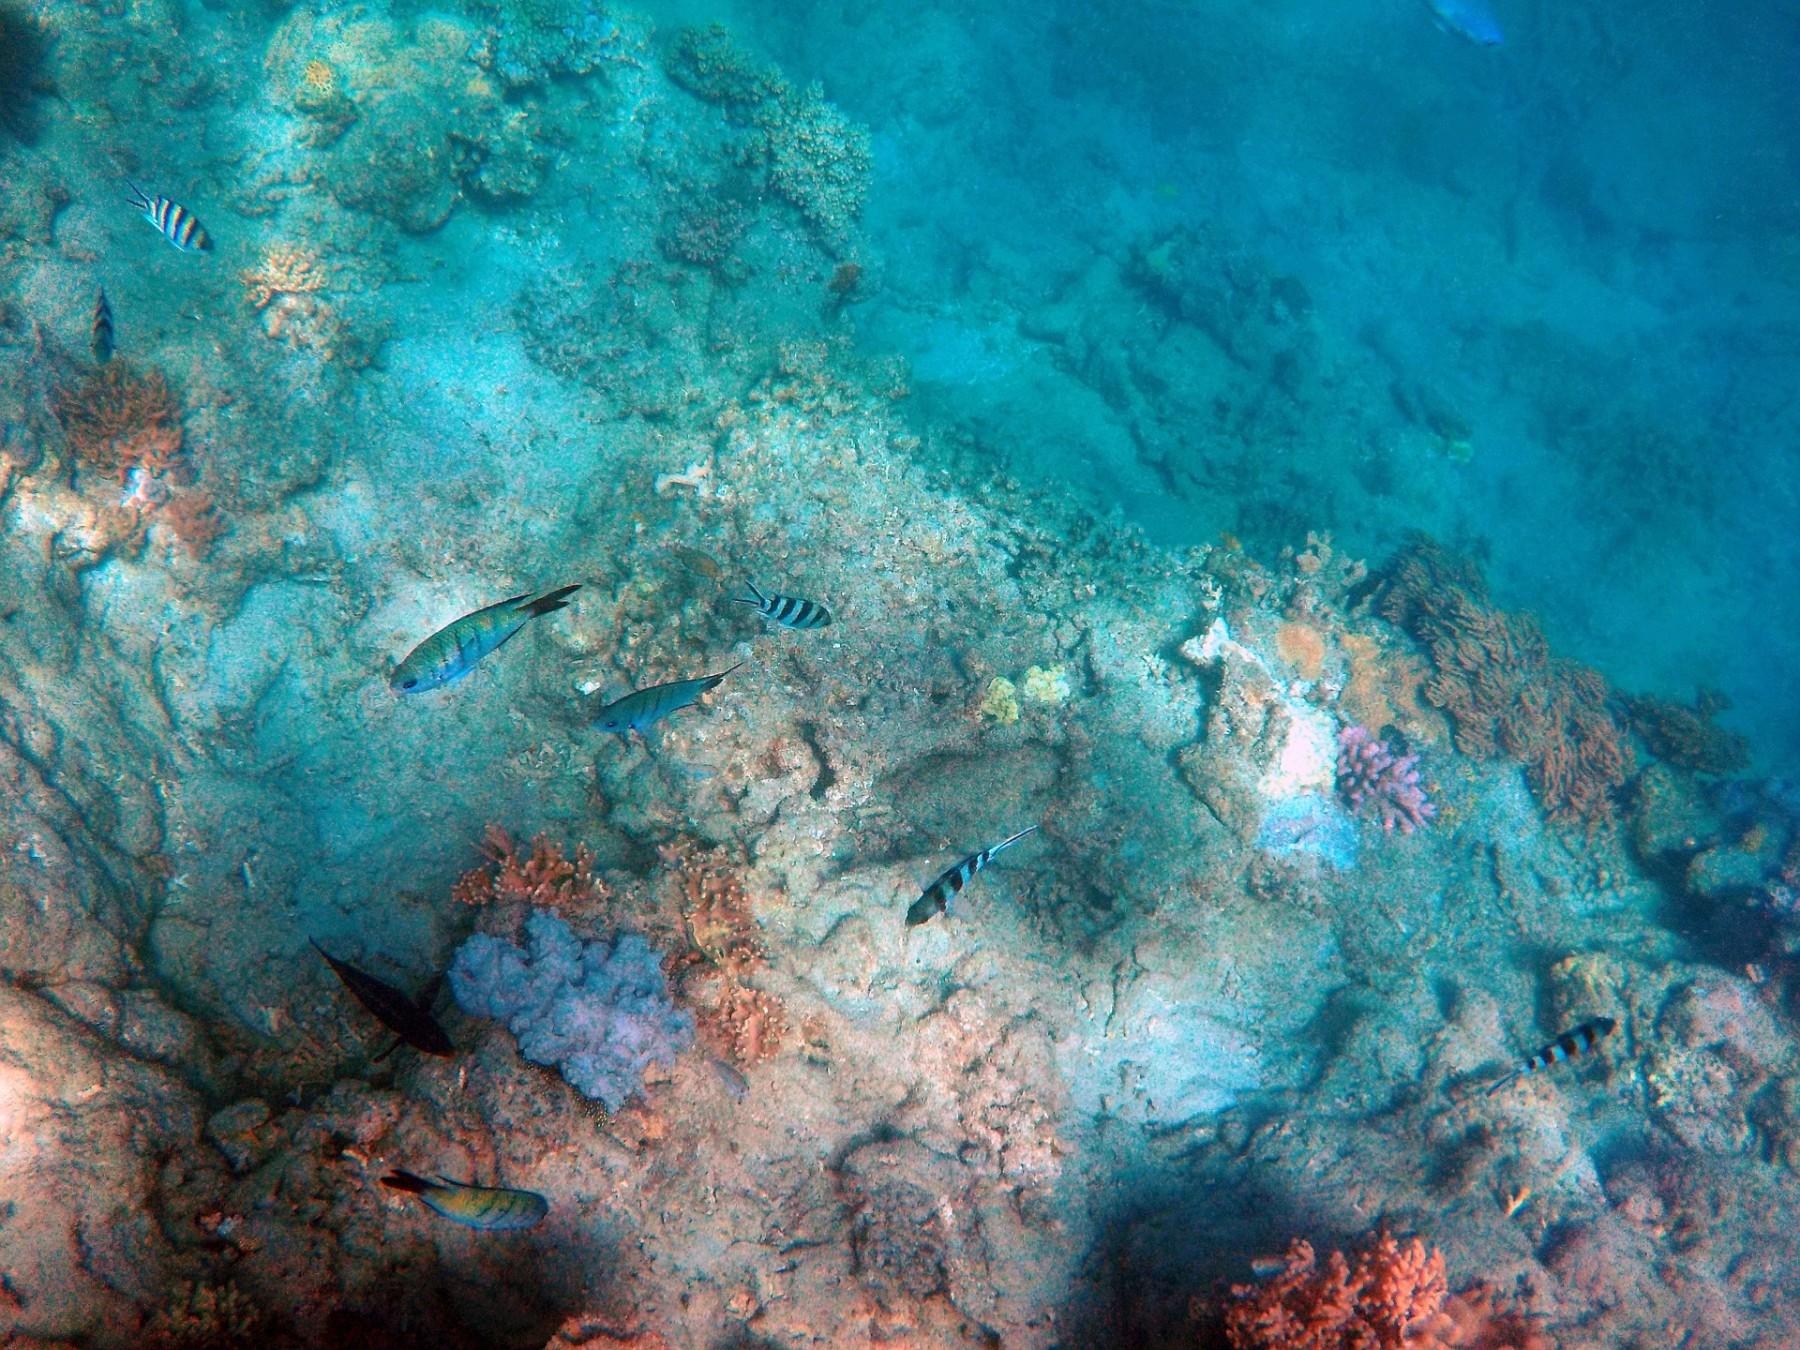 under-the-sea-401520 1920